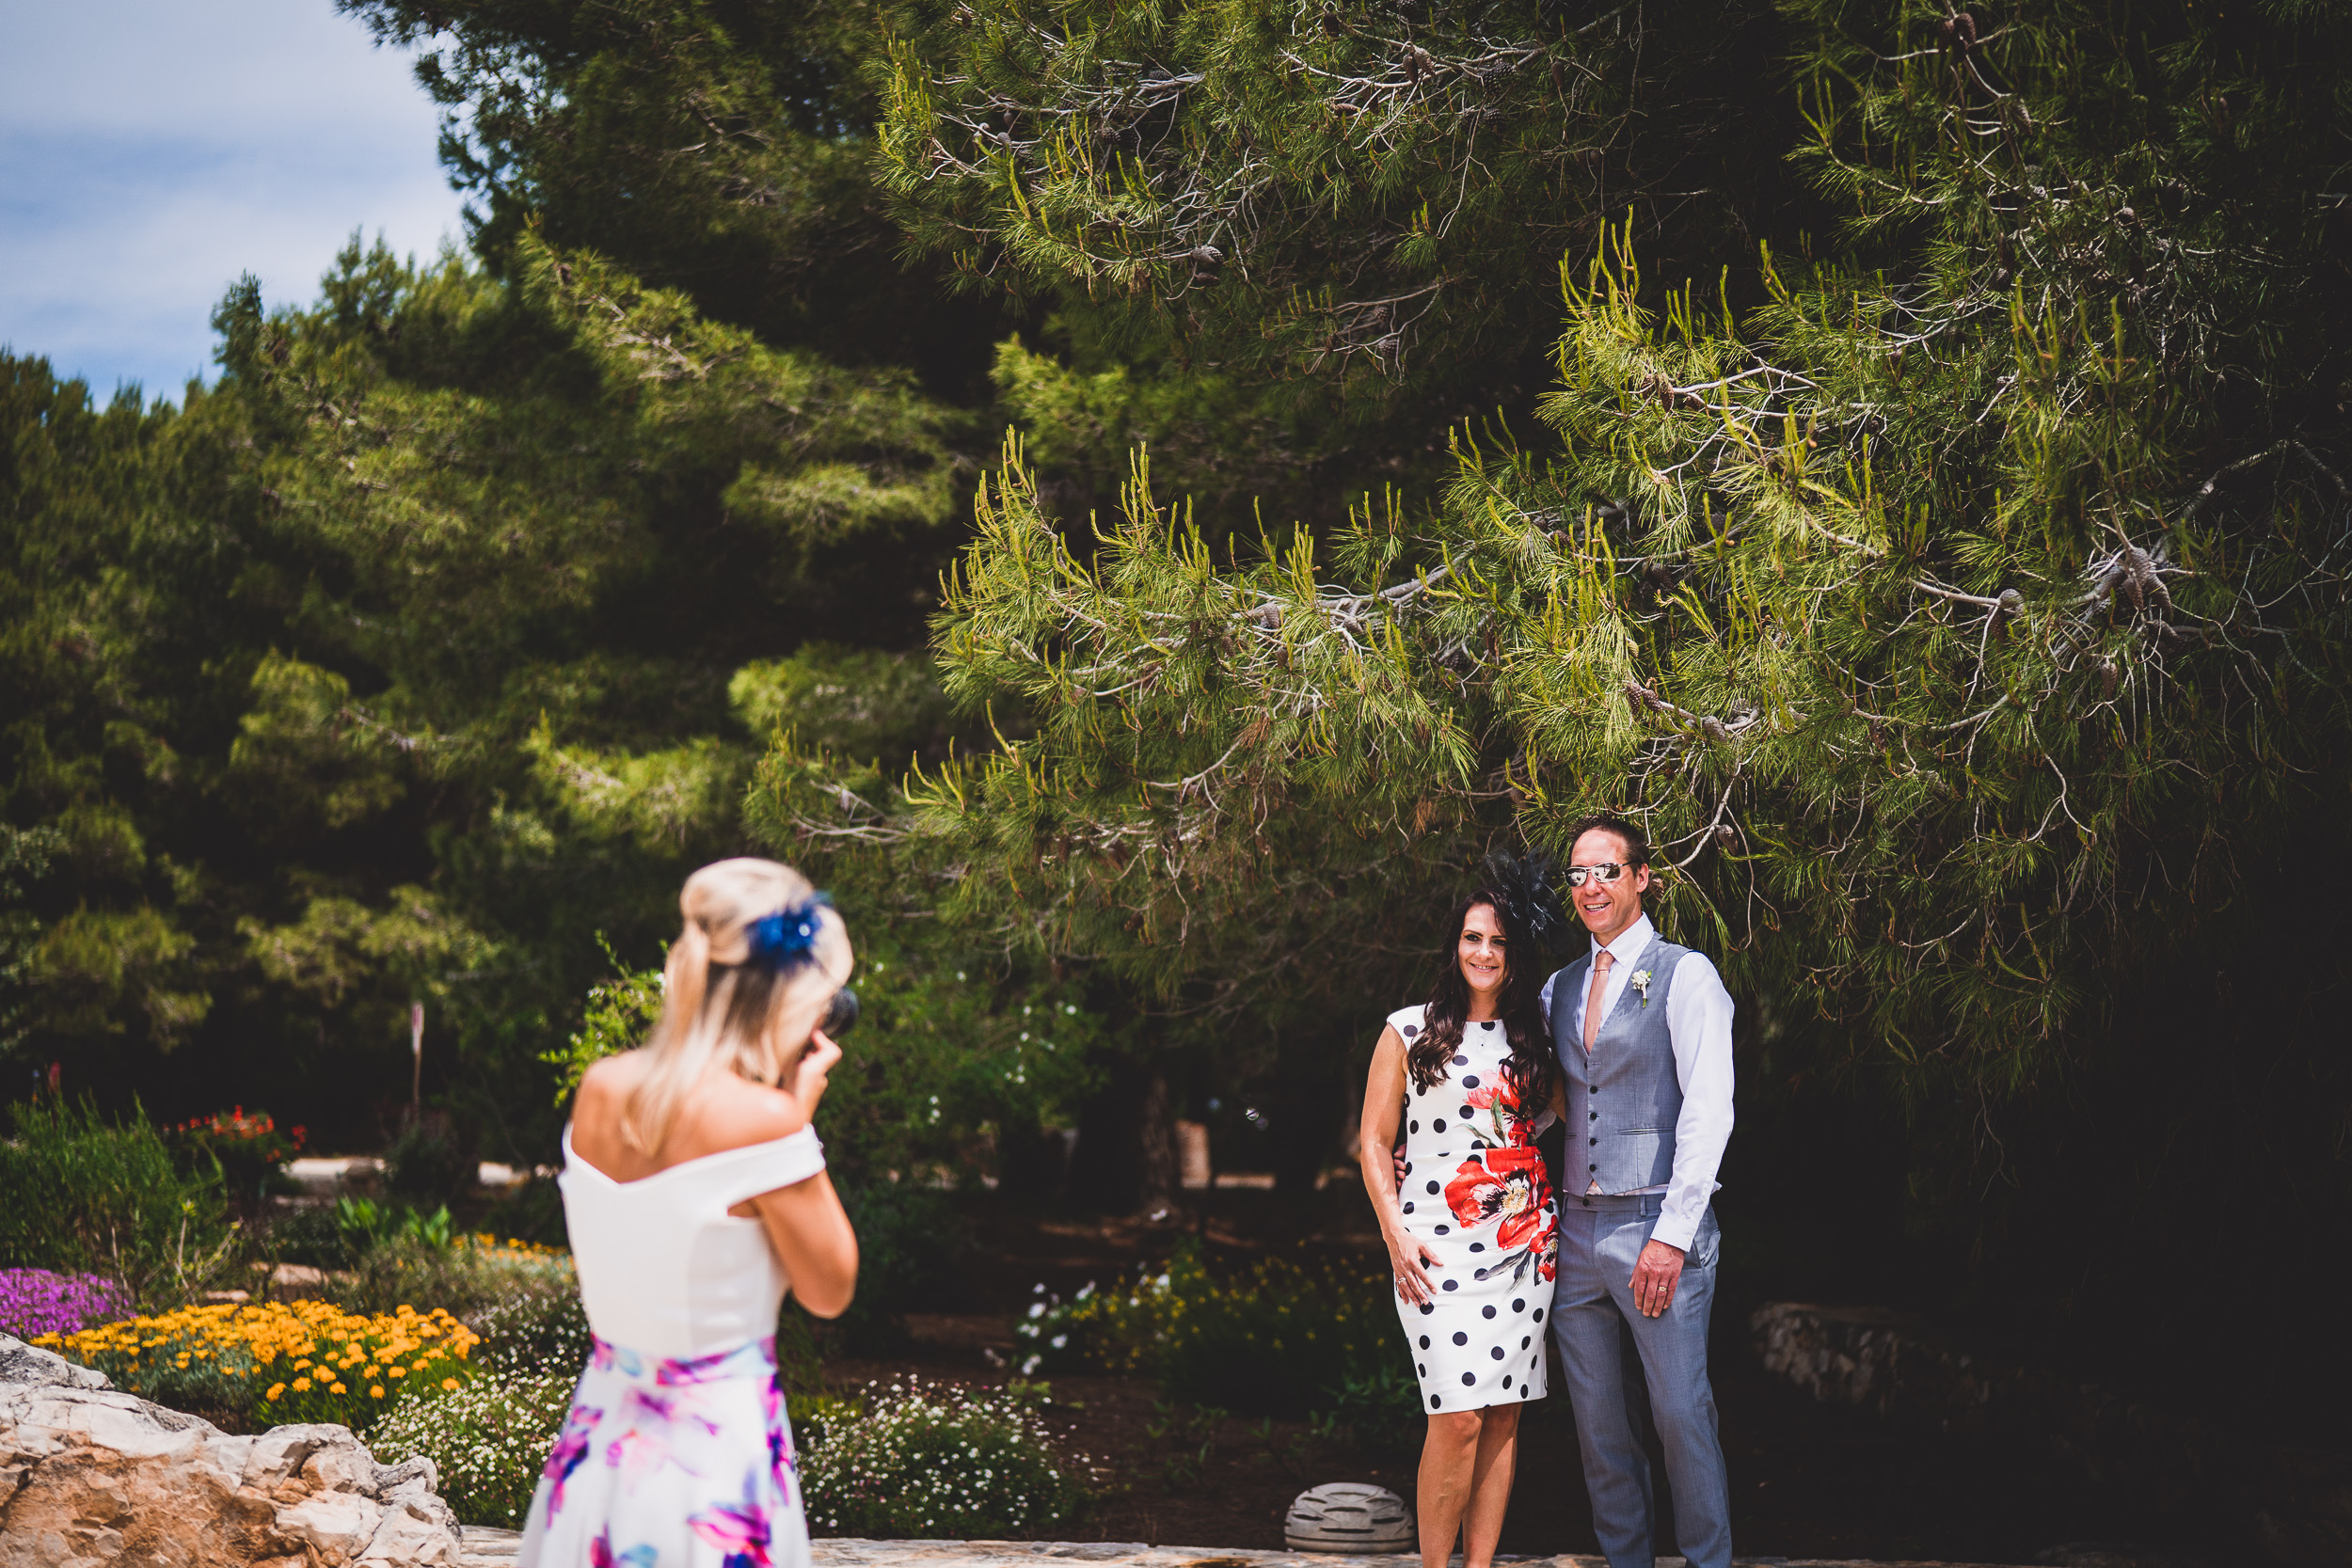 Destination wedding photography | Anna & Nigel destination wedding photography 016